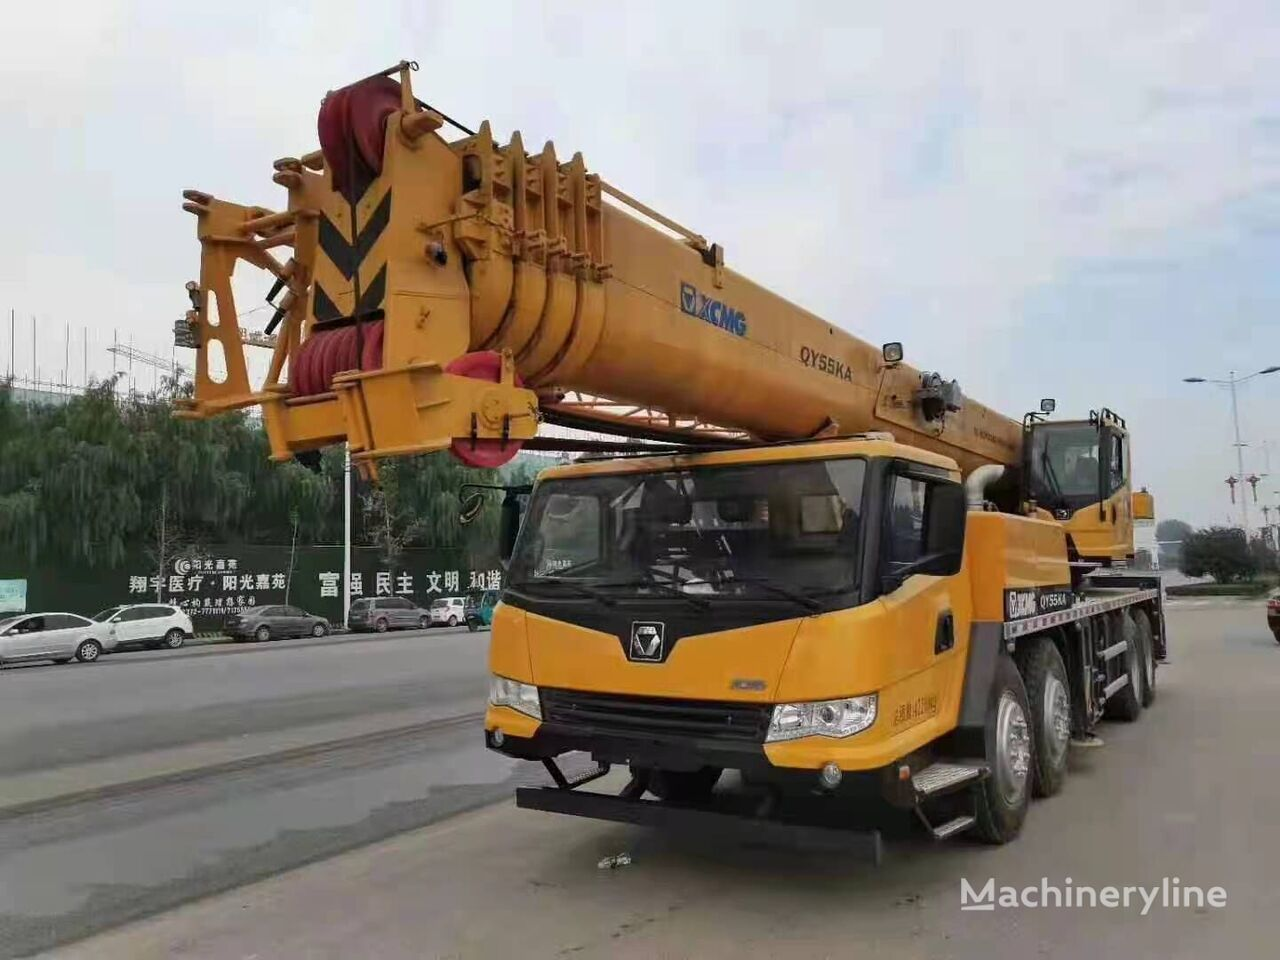 2020-xcmg-qy55ka-equipment-cover-image